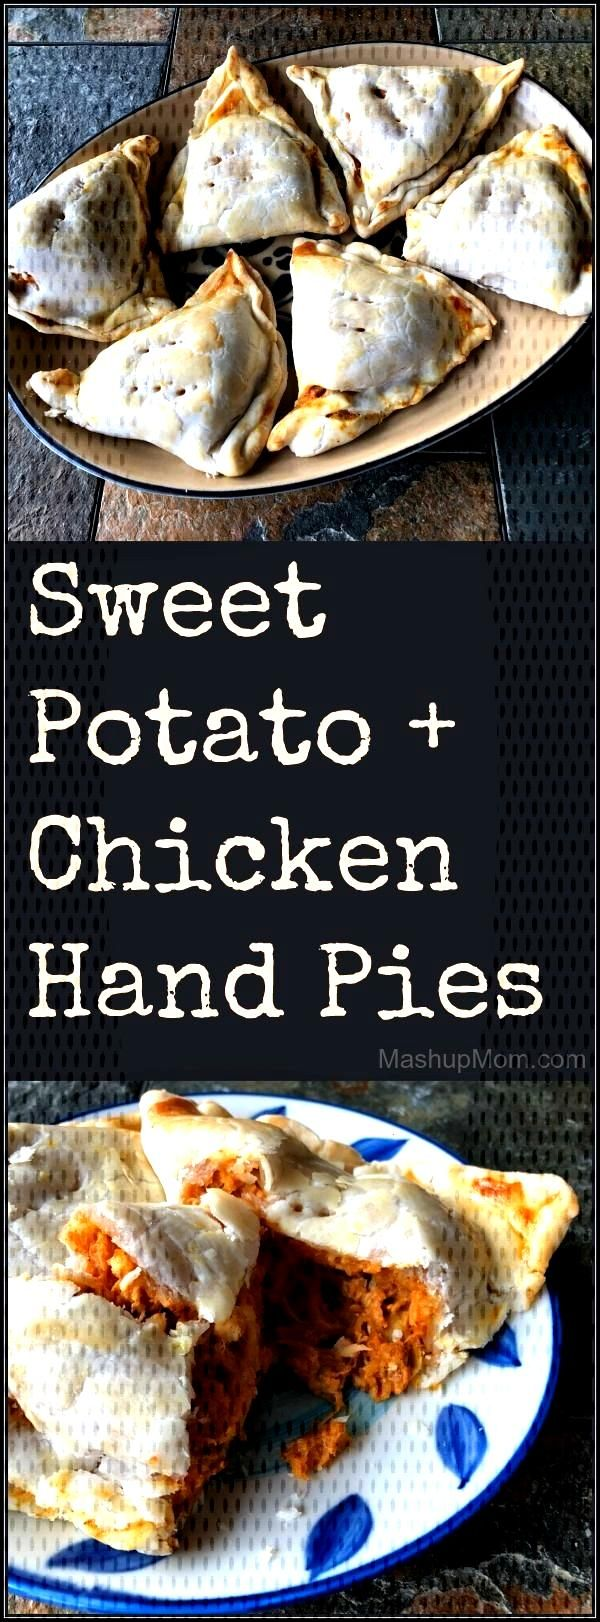 Sweet Potato + Chicken Hand Pies,